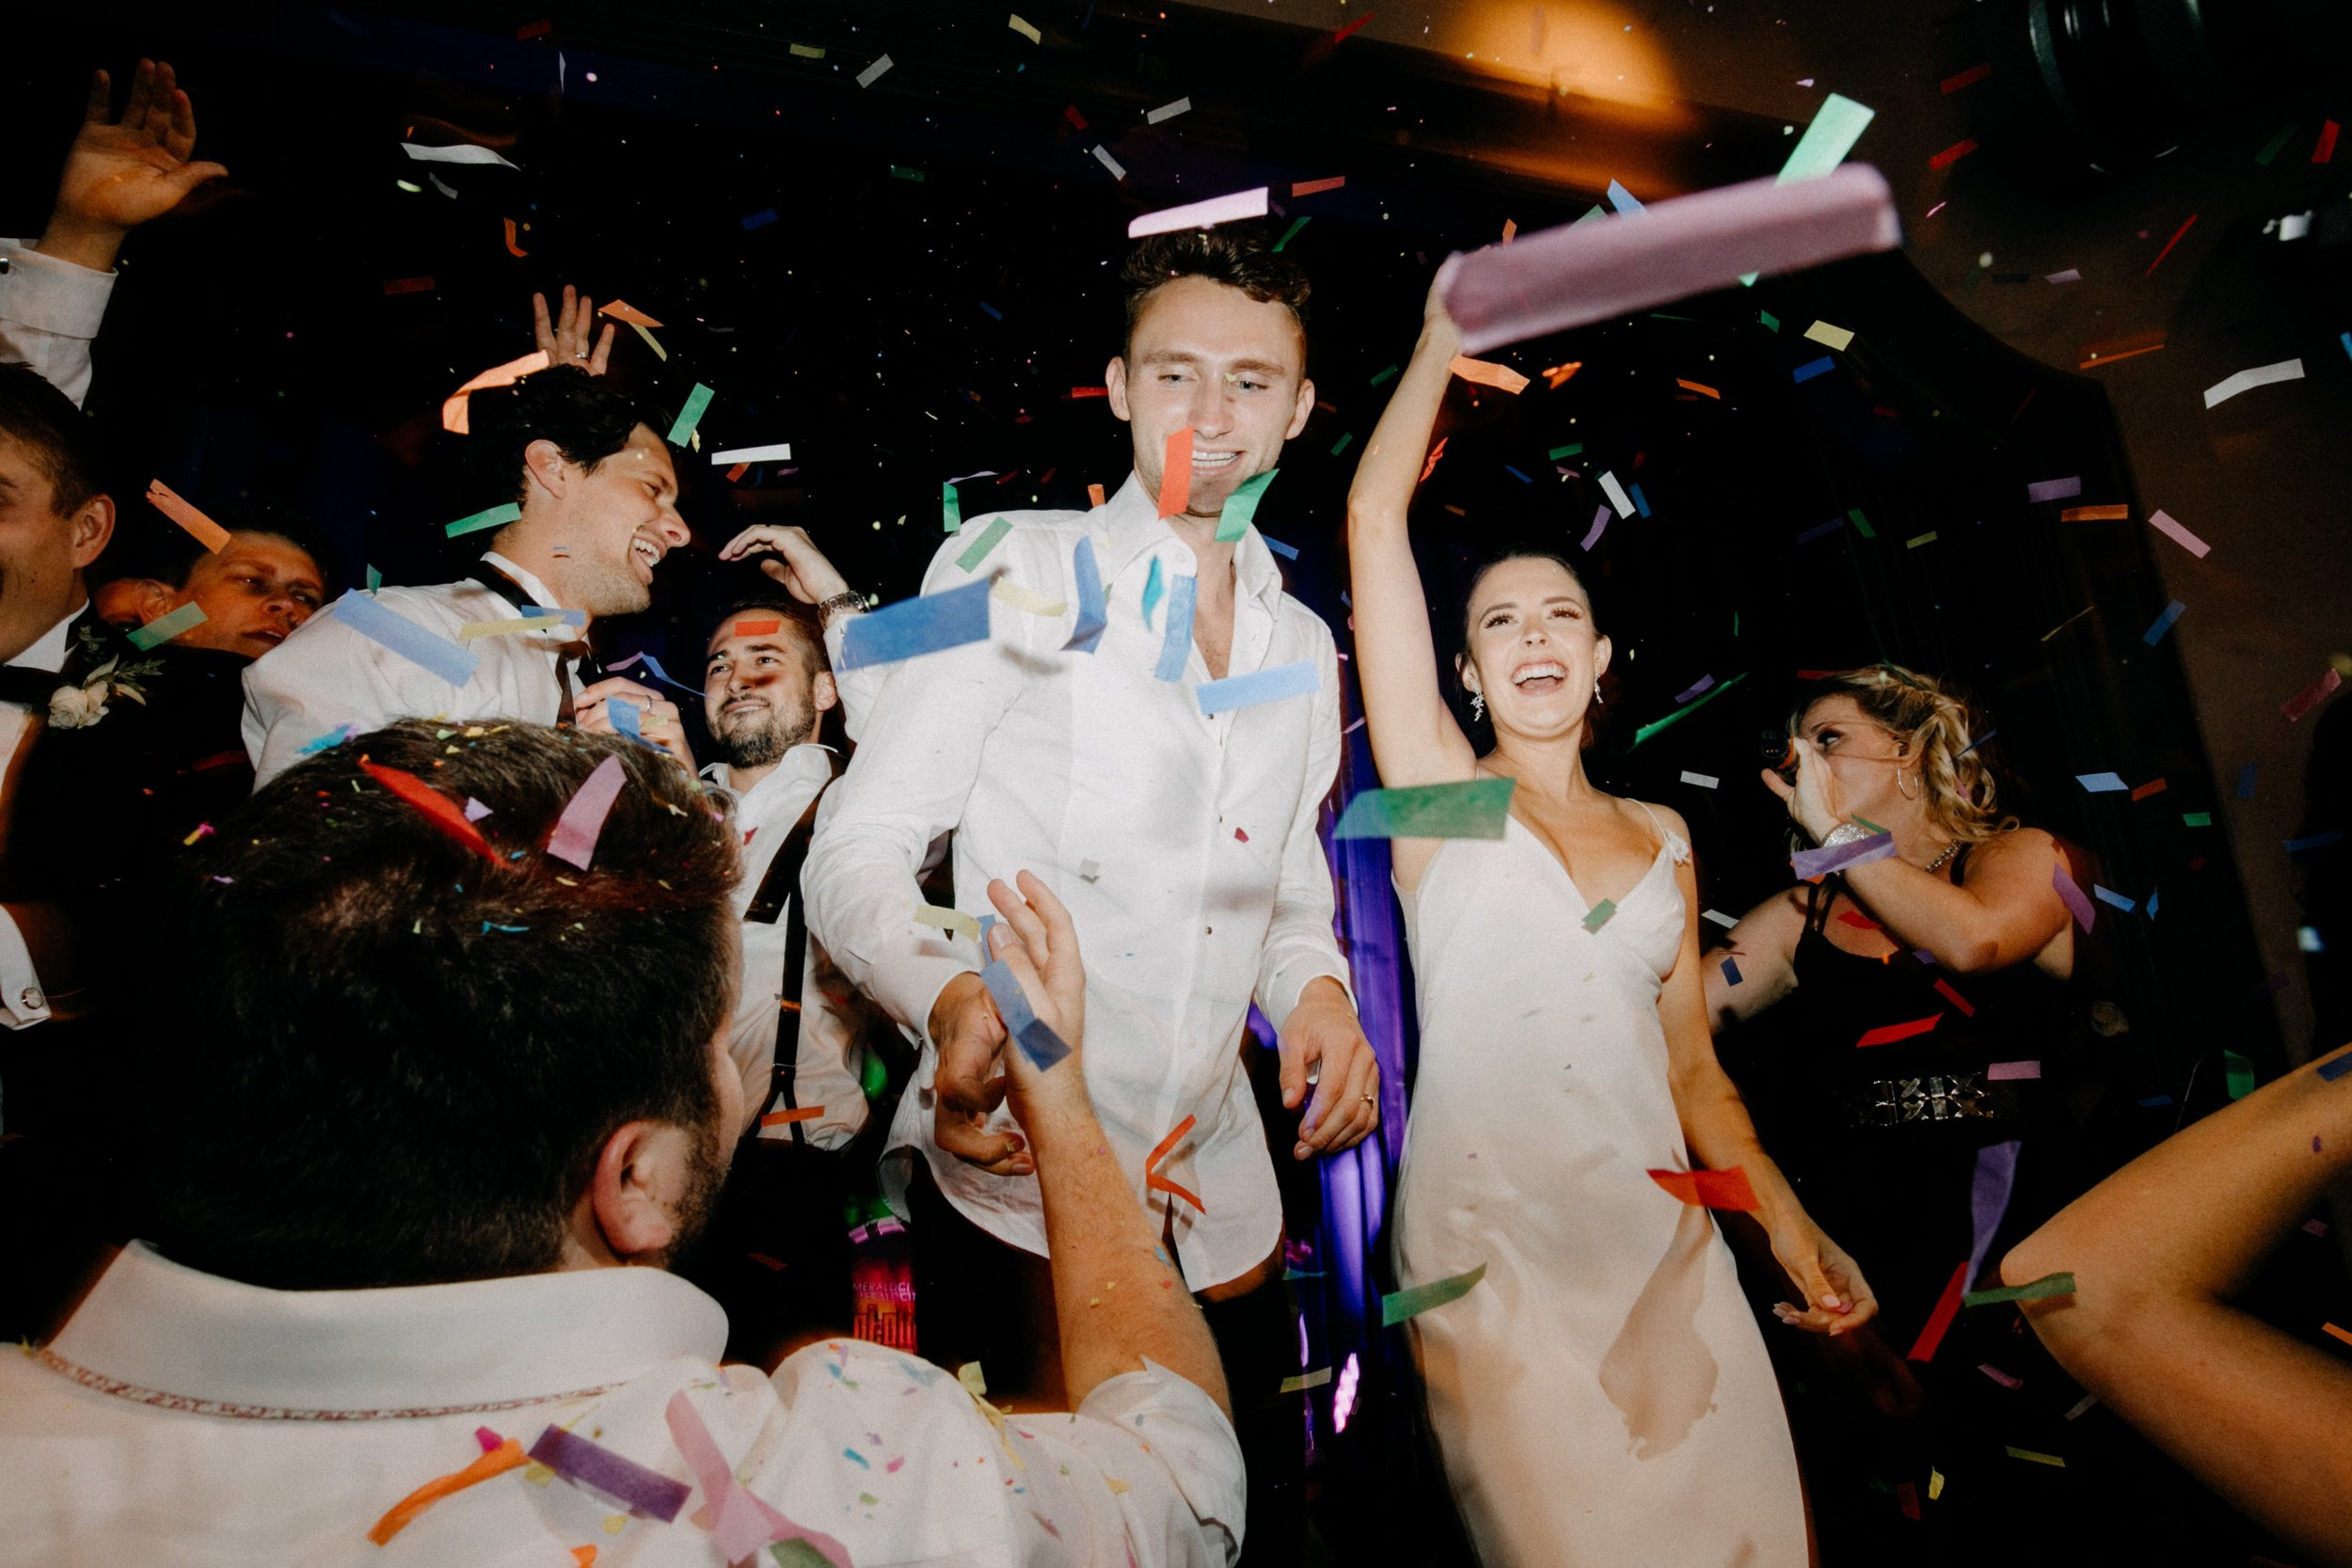 st-anthony-hotel-wedding-photography-10210san-antonio.JPG